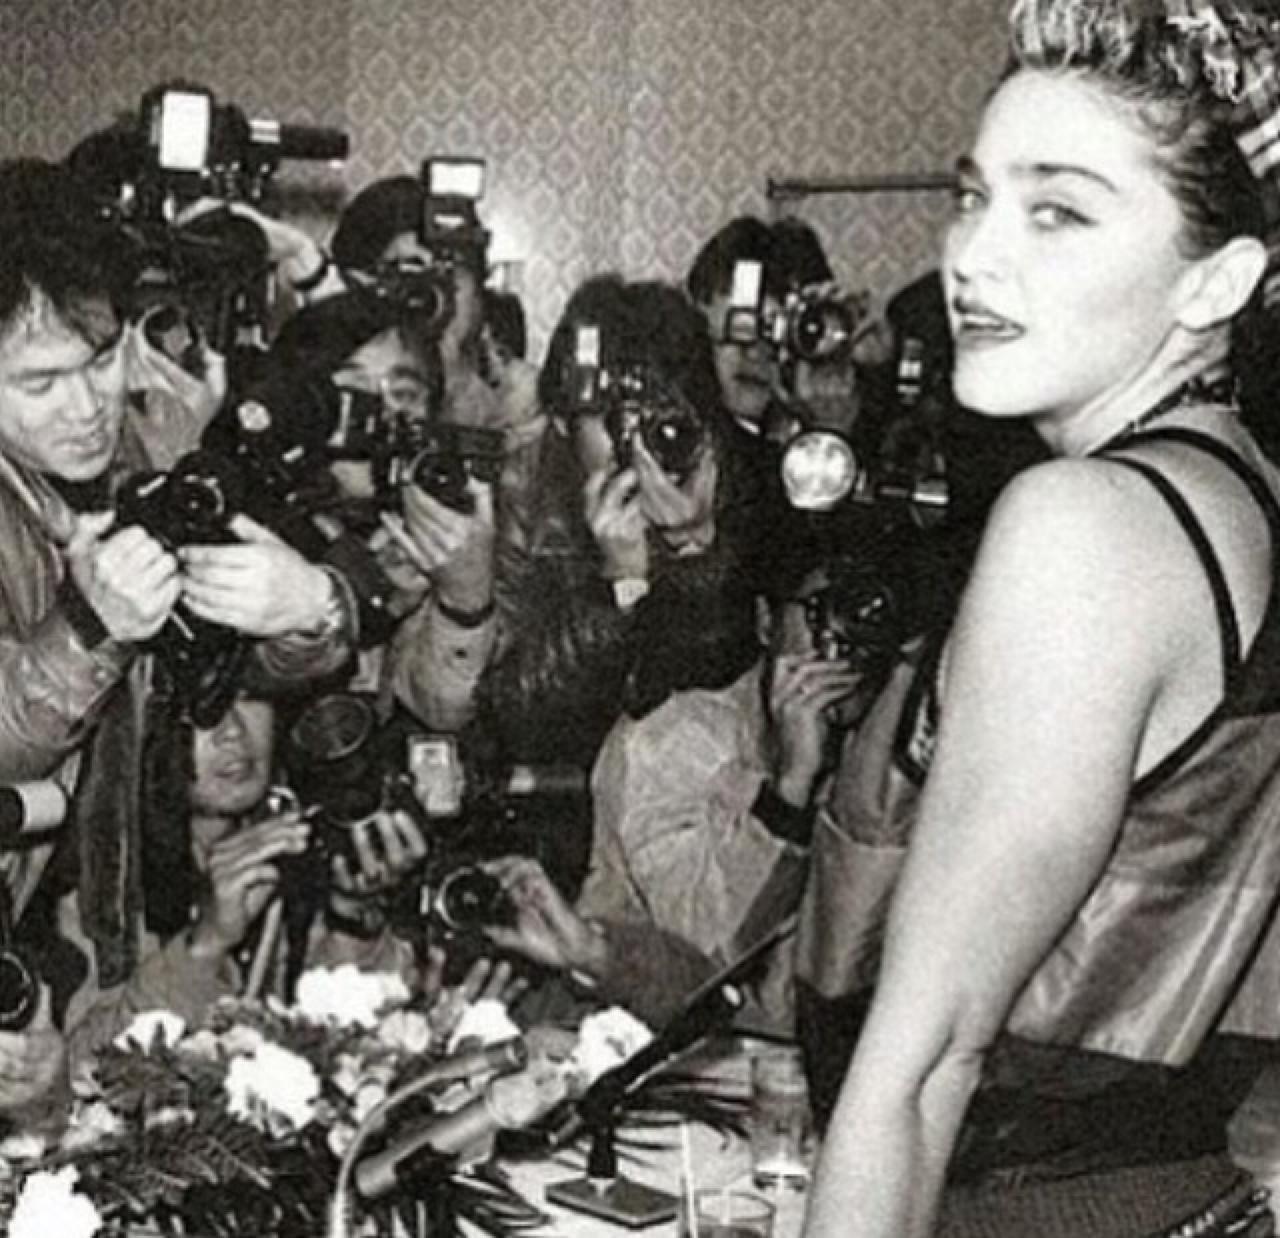 madonna japon 1984